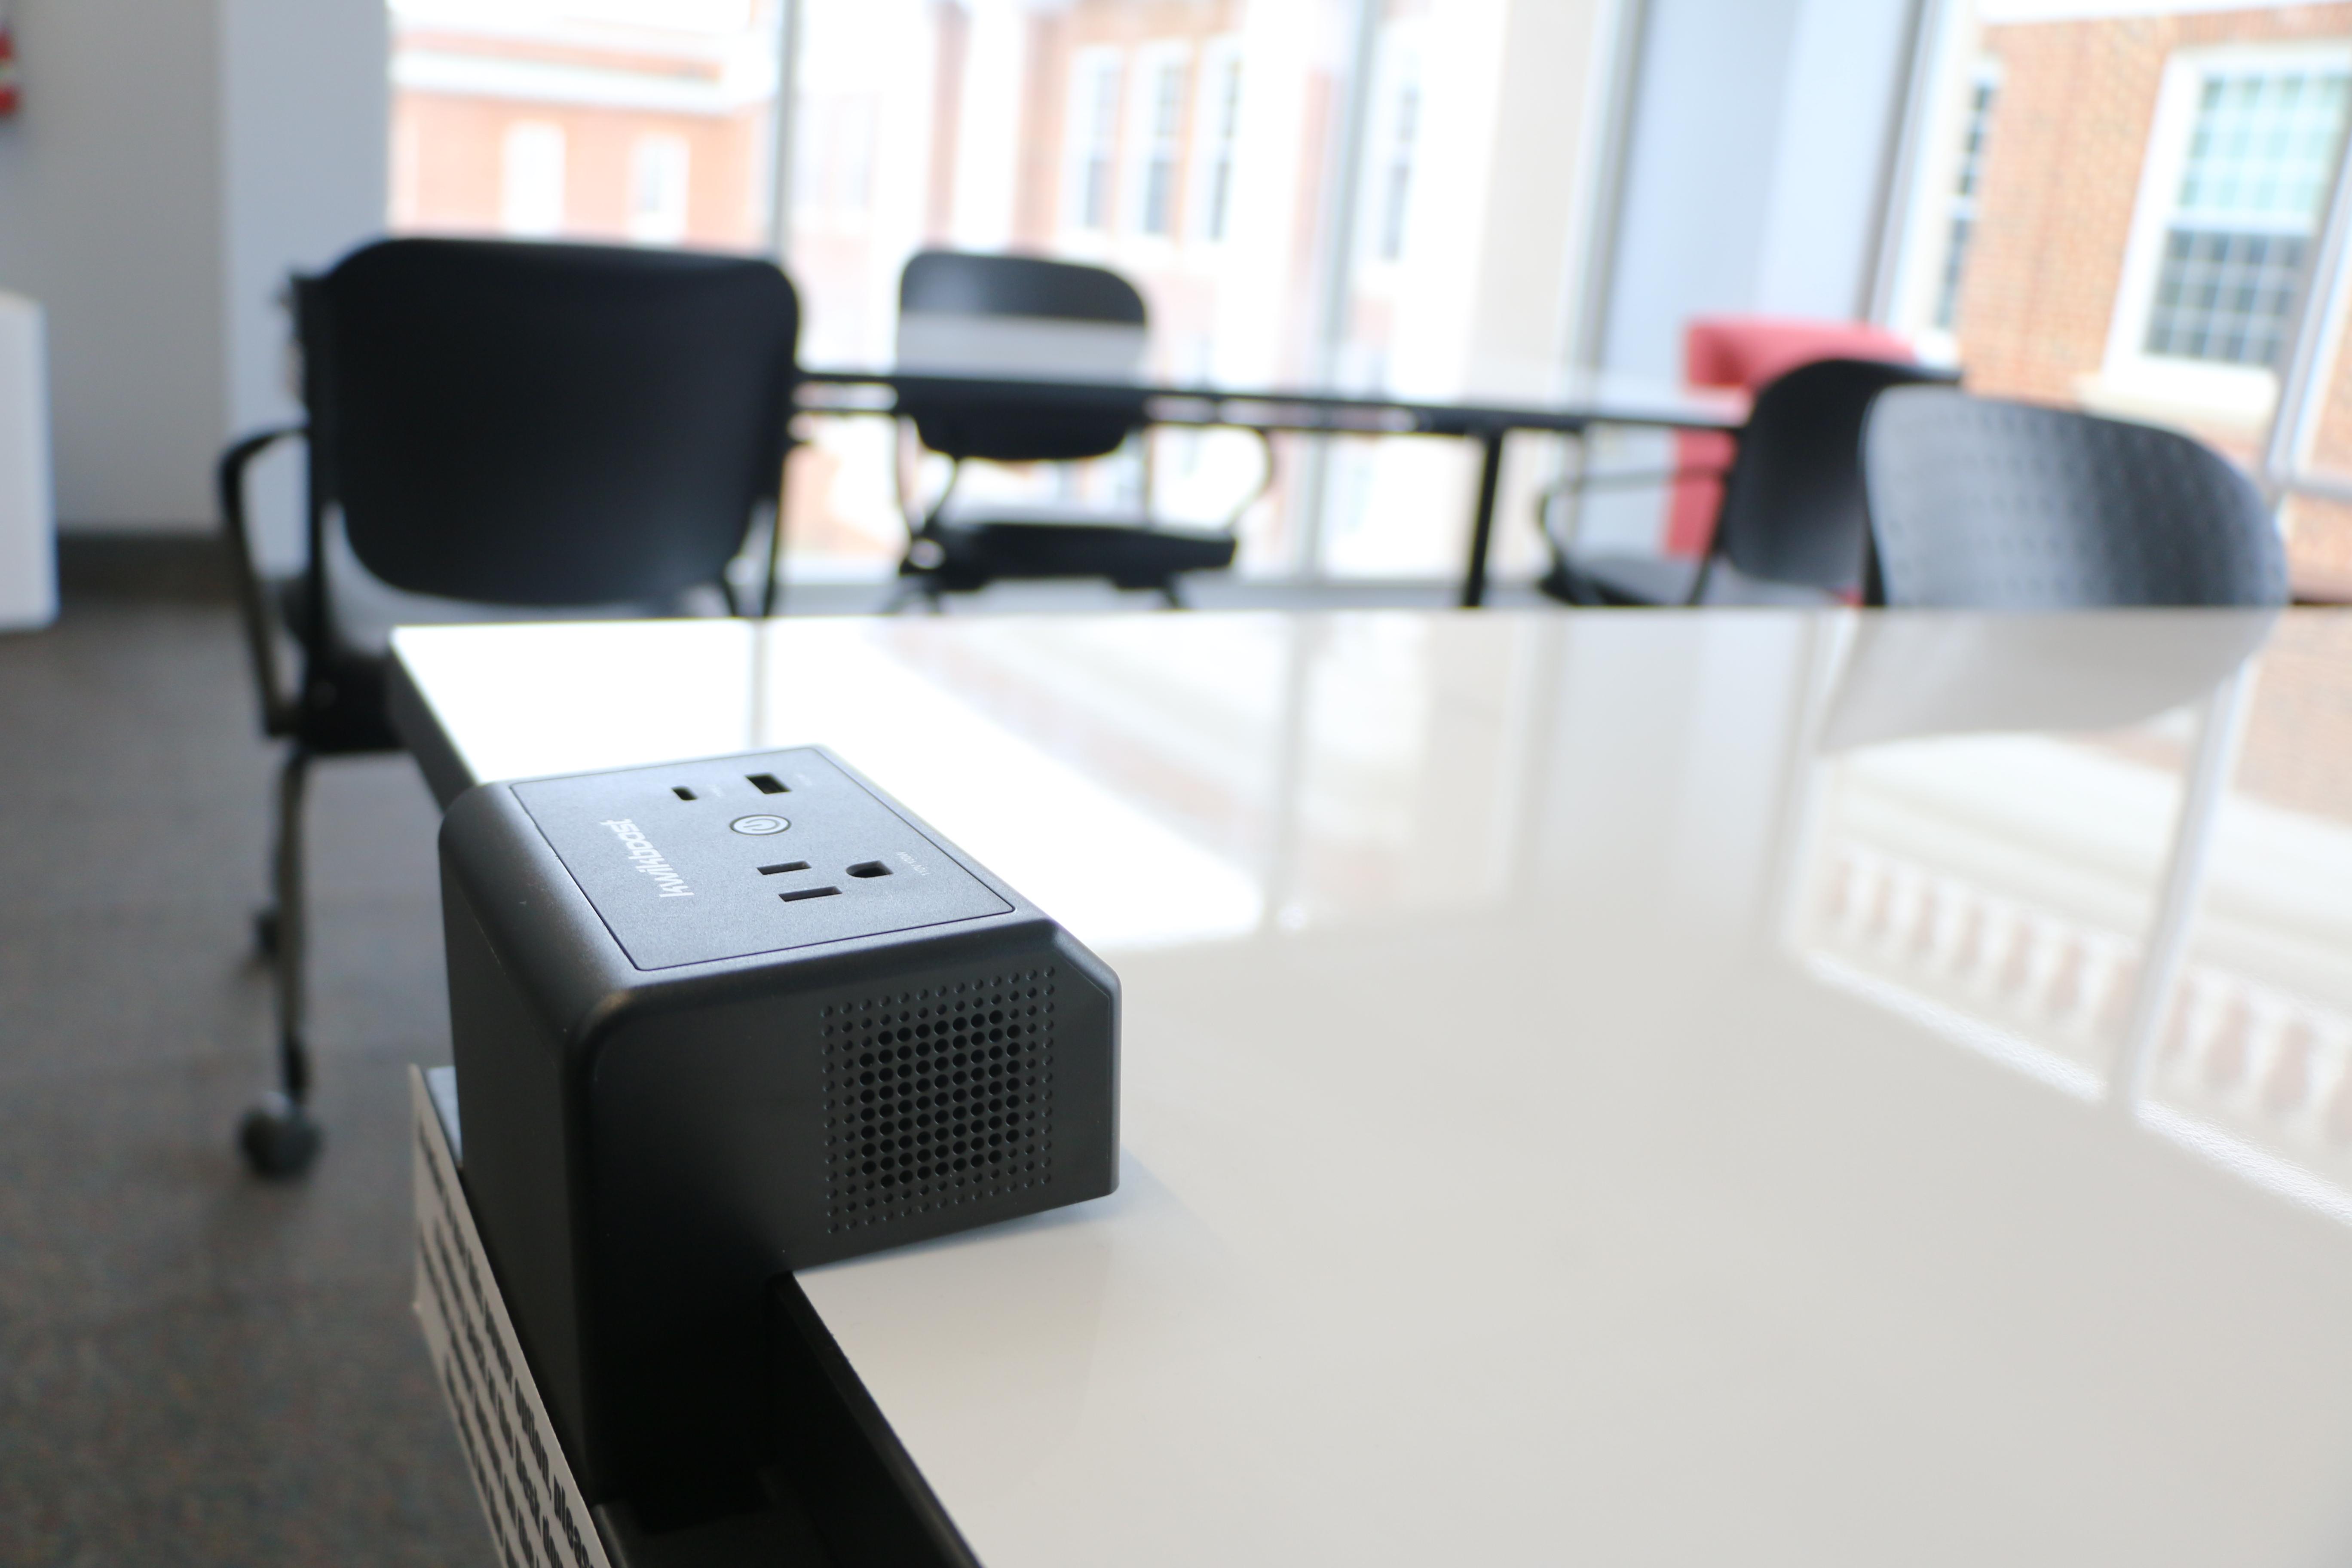 Portable Power Adaptors